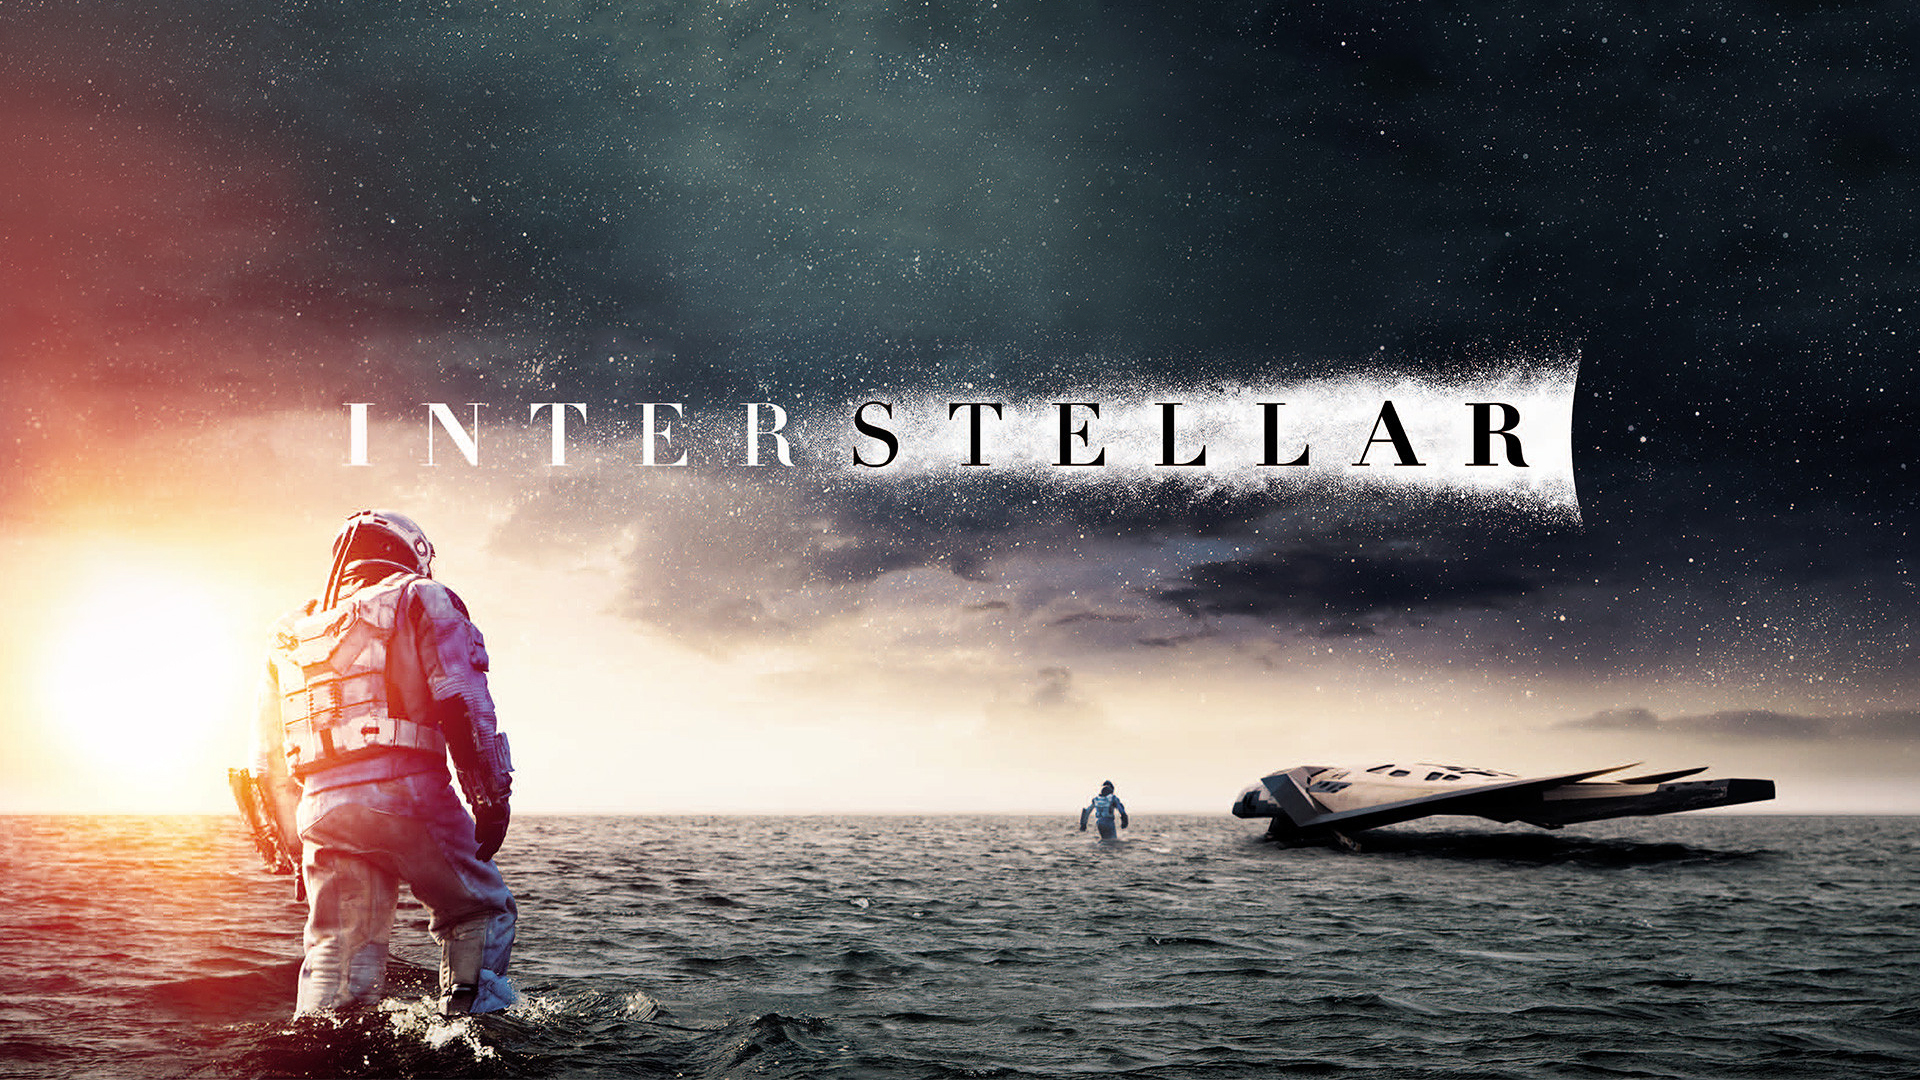 Interstellar IMAX review